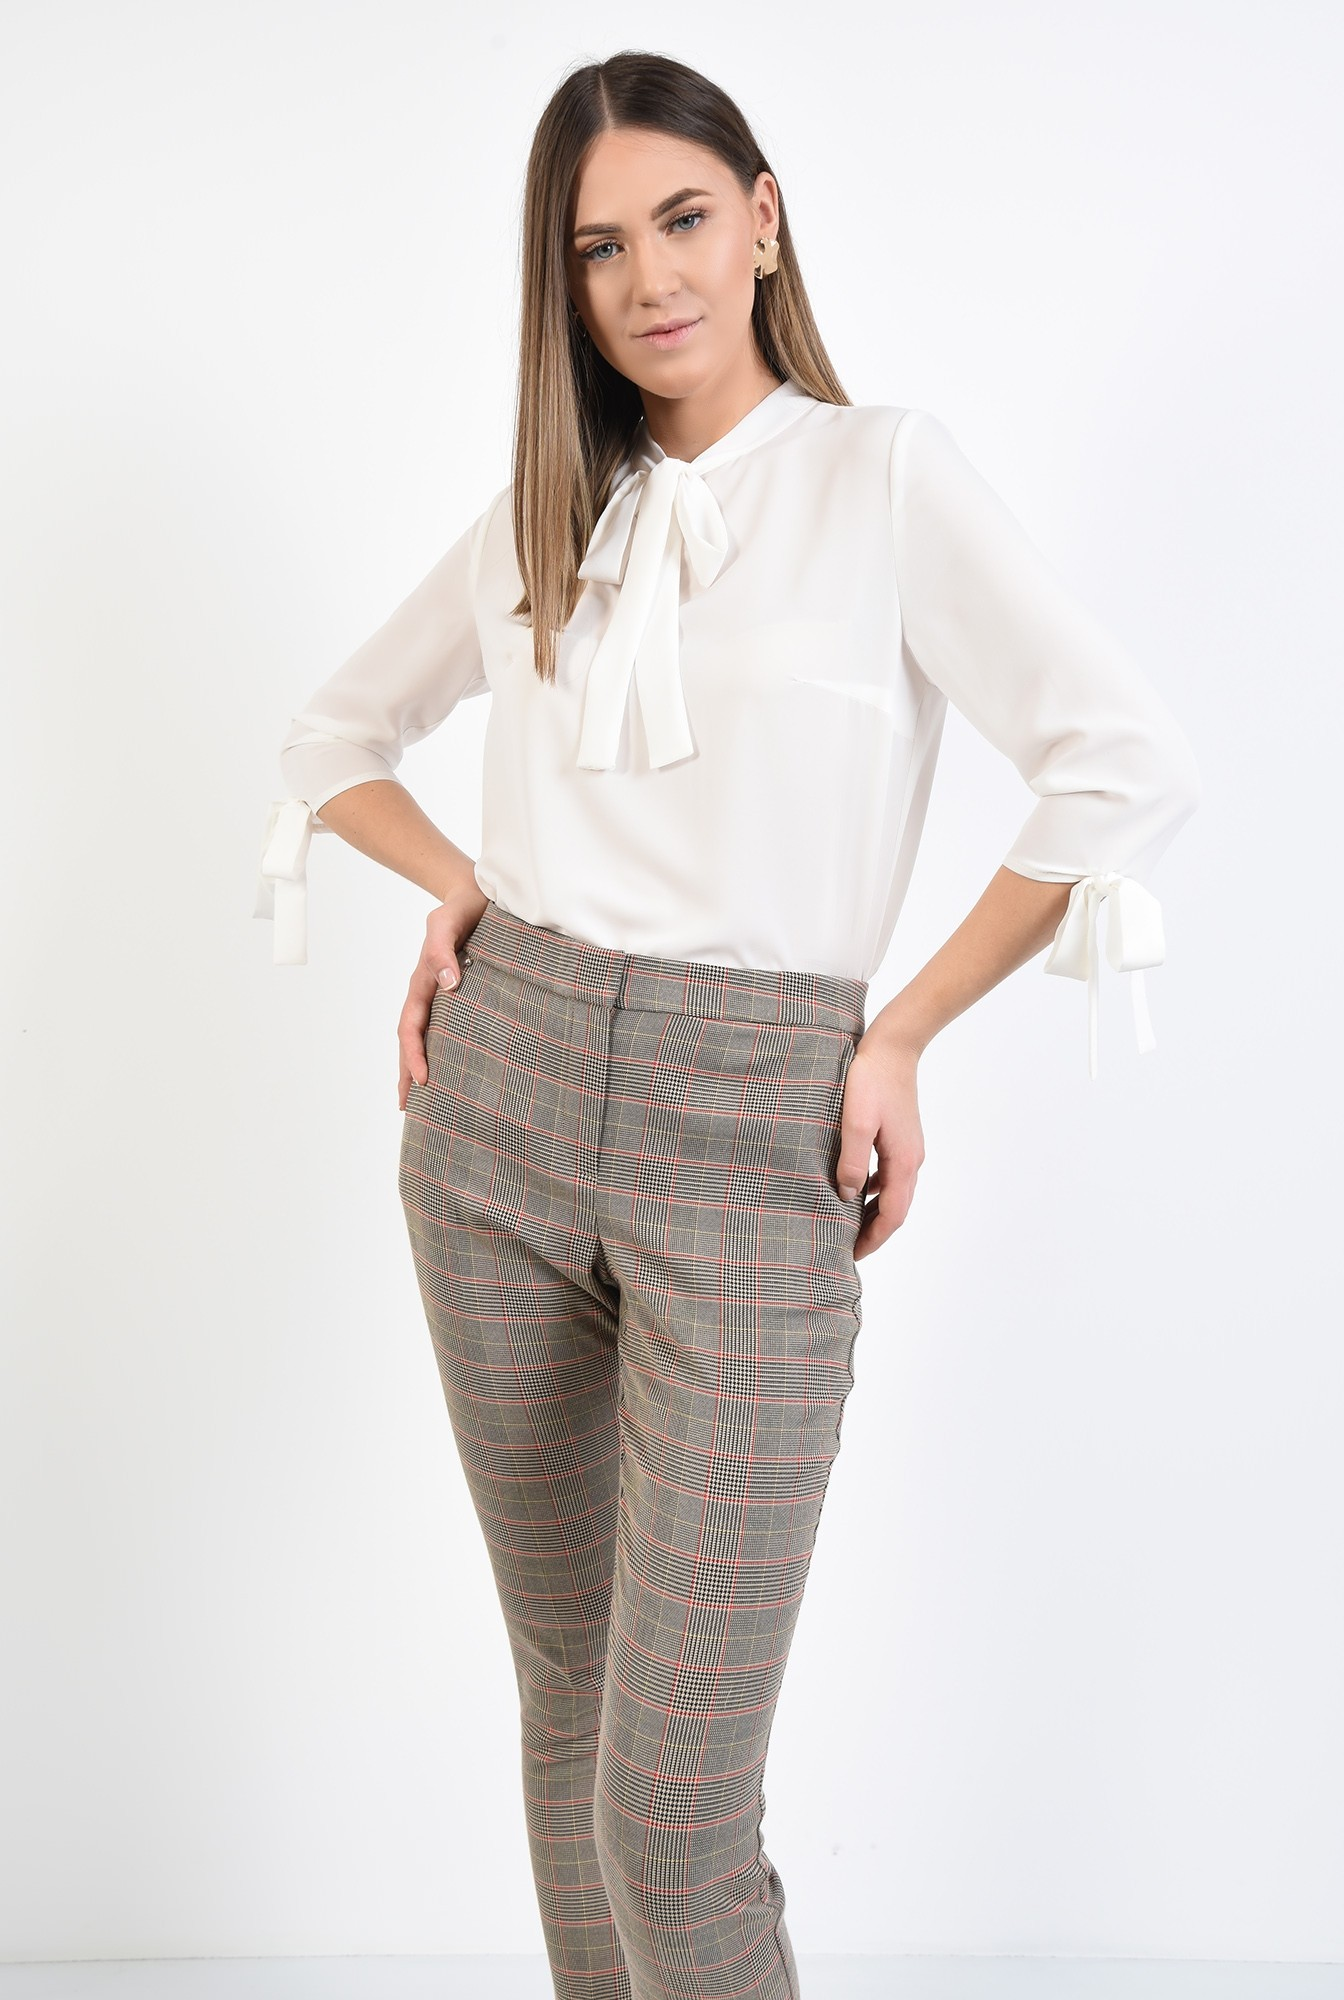 0 - 360 - pantaloni de costum, in carouri, conici, buzunare in cusatura